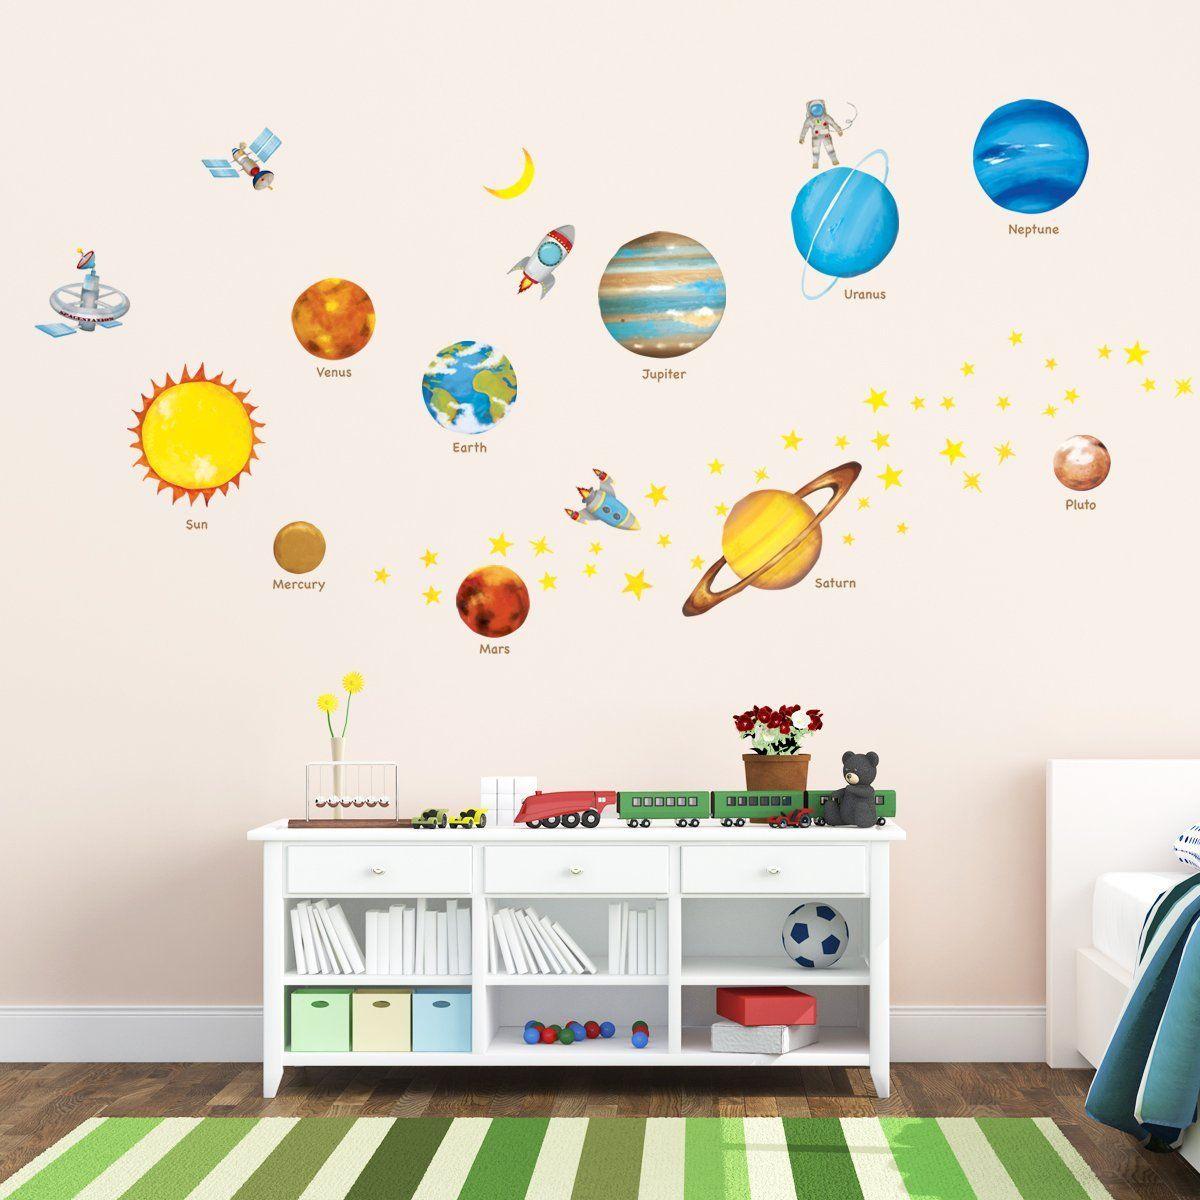 New Decowall DW Planeten in den Weltraum Peel u Stick Nursery Wandtattoo Aufkleber Amazon de Baby sch n Pinterest Aufkleber Wandtattoo und Babys